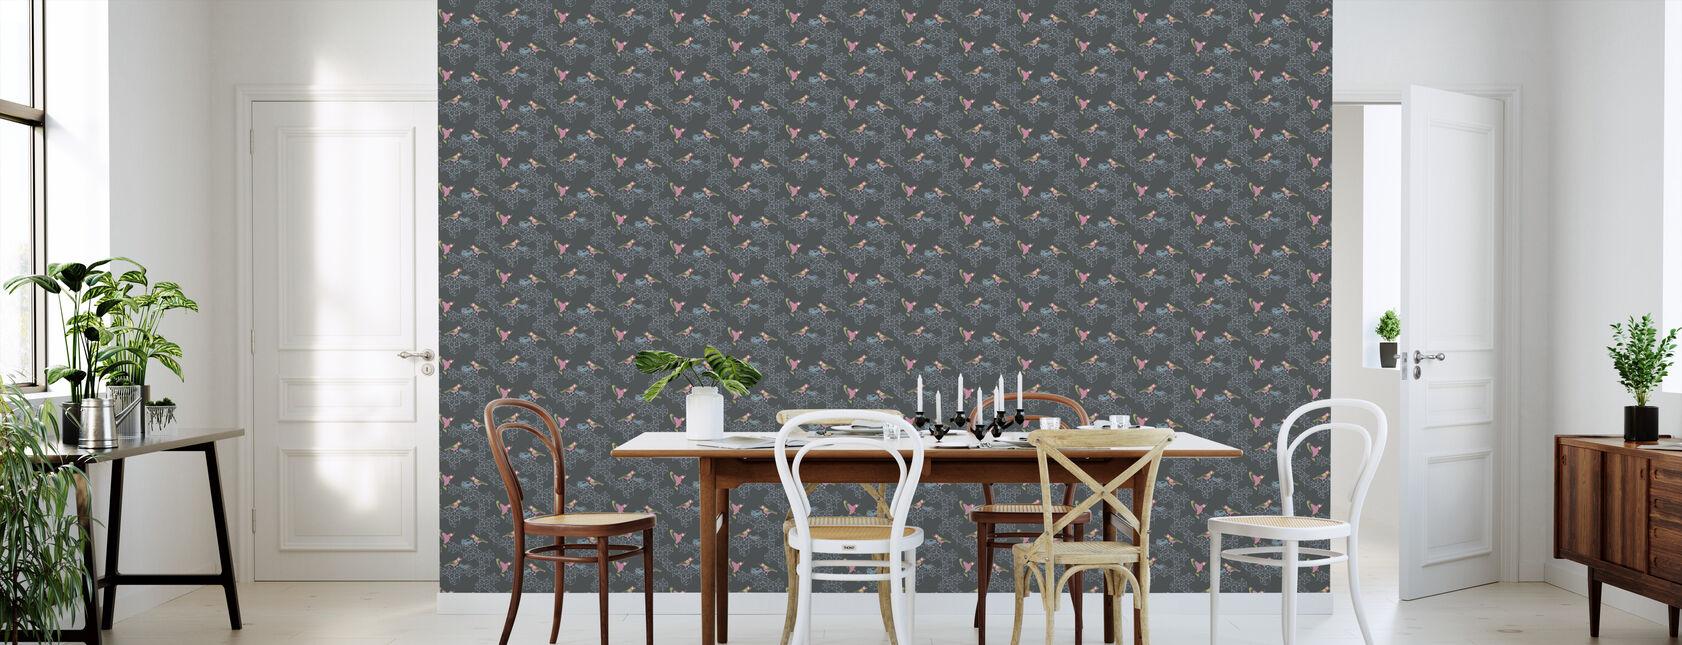 Birds Nest - Small - Wallpaper - Kitchen